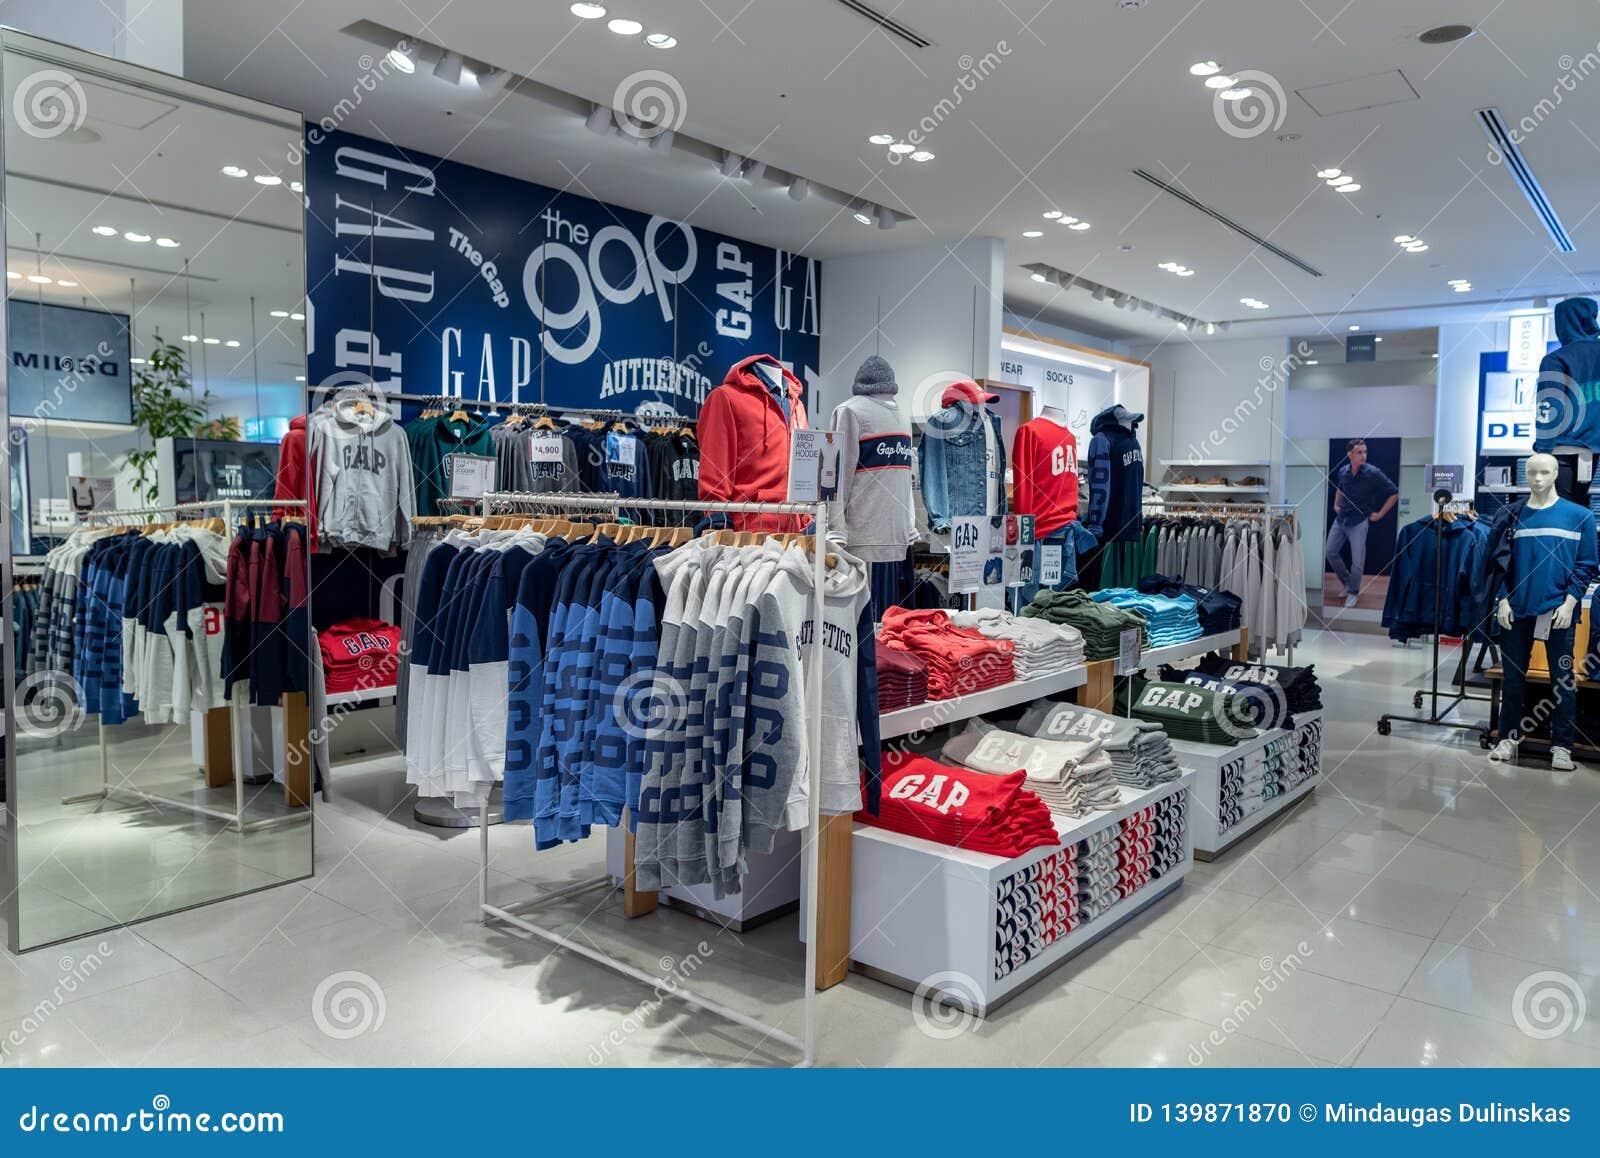 TOKYO, JAPAN - FEBRUARY 5, 2019: Tokyo Ginza Area GAP shop interior